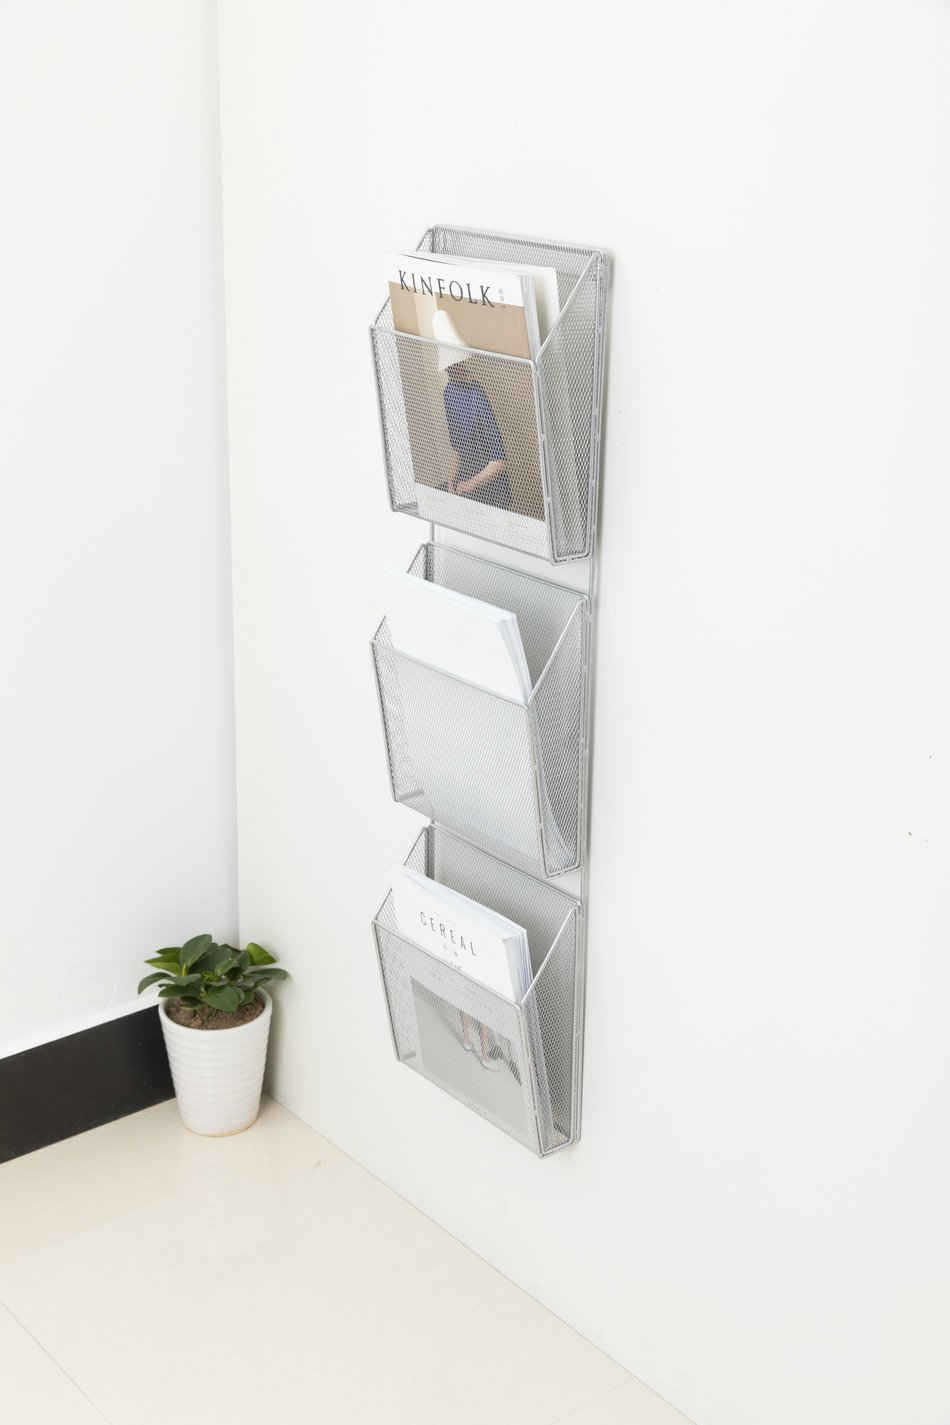 Lecent@ 3 Pocket Wall Mount Literature Rack Organizer Silver Steel Mesh Storage Baskets Metal Wall Magazine File Rack by Lecent